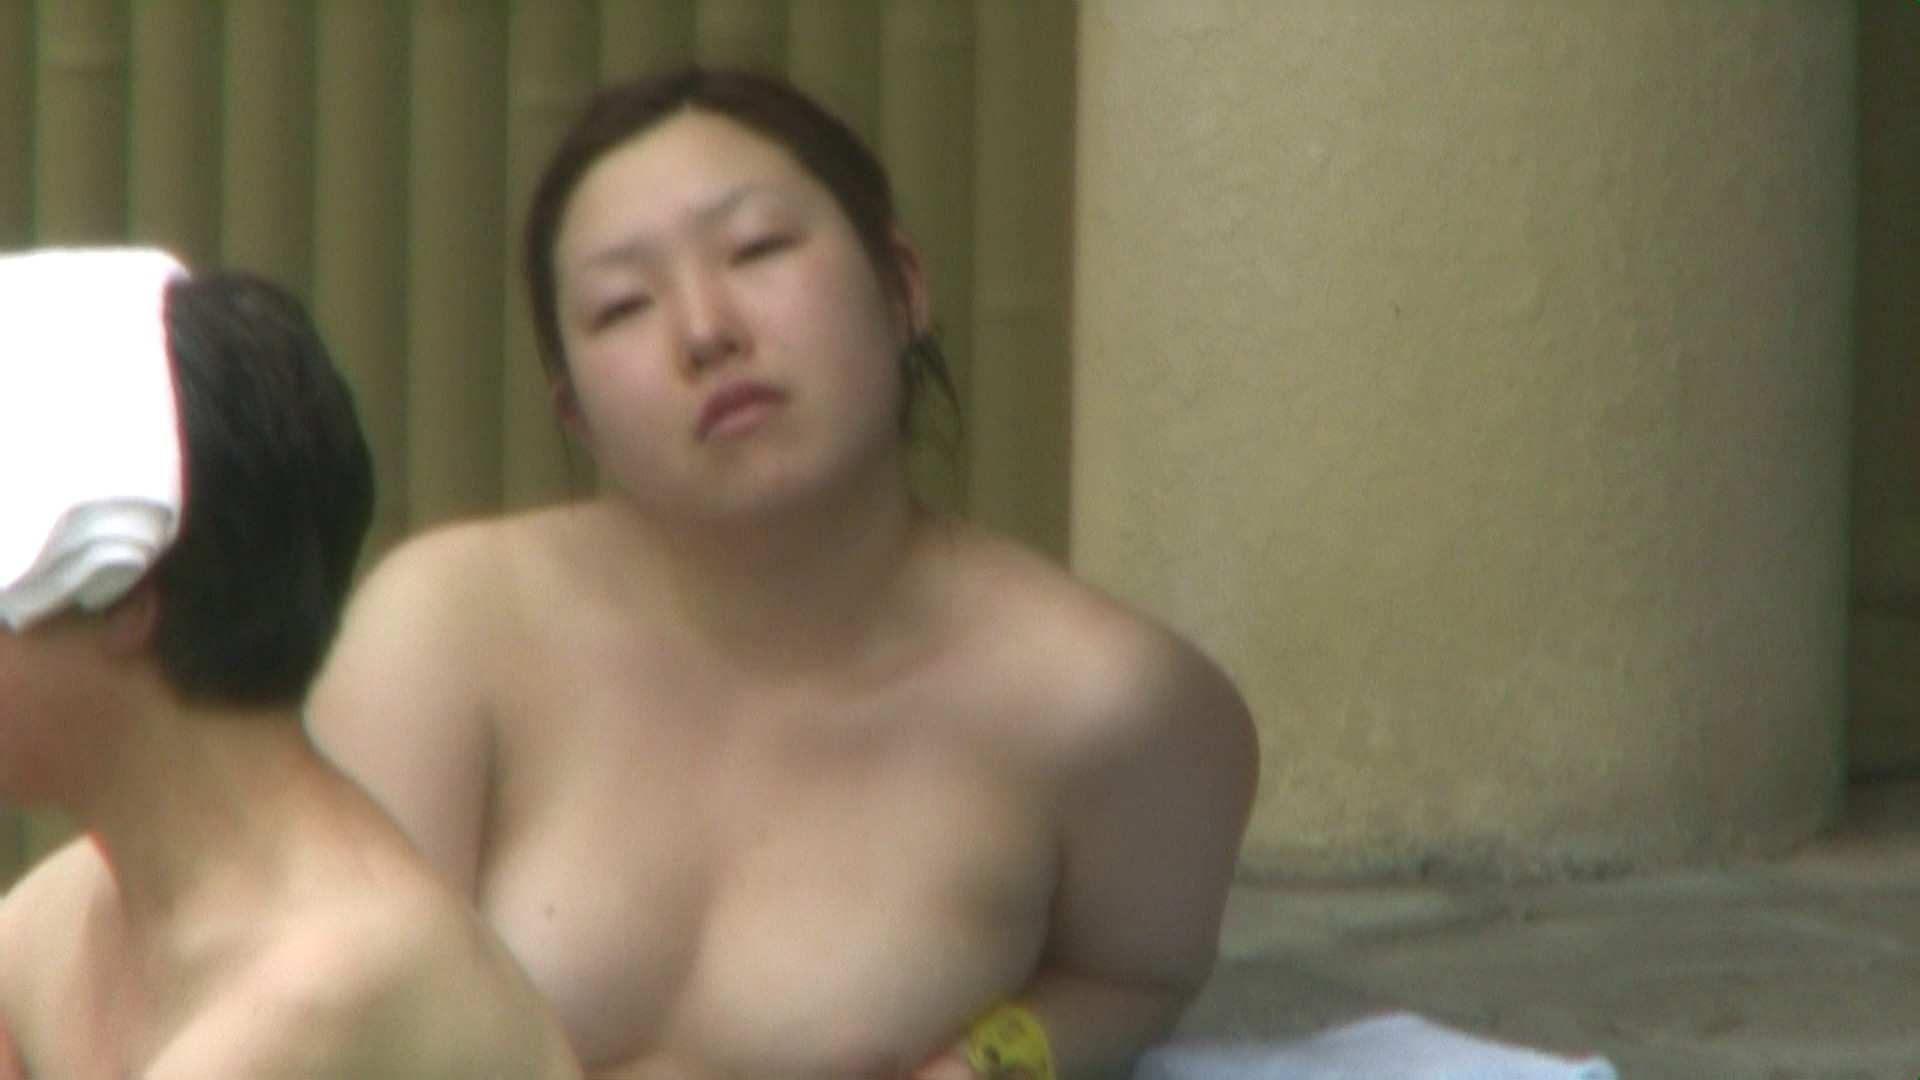 Aquaな露天風呂Vol.72【VIP限定】 露天風呂編  98PIX 6